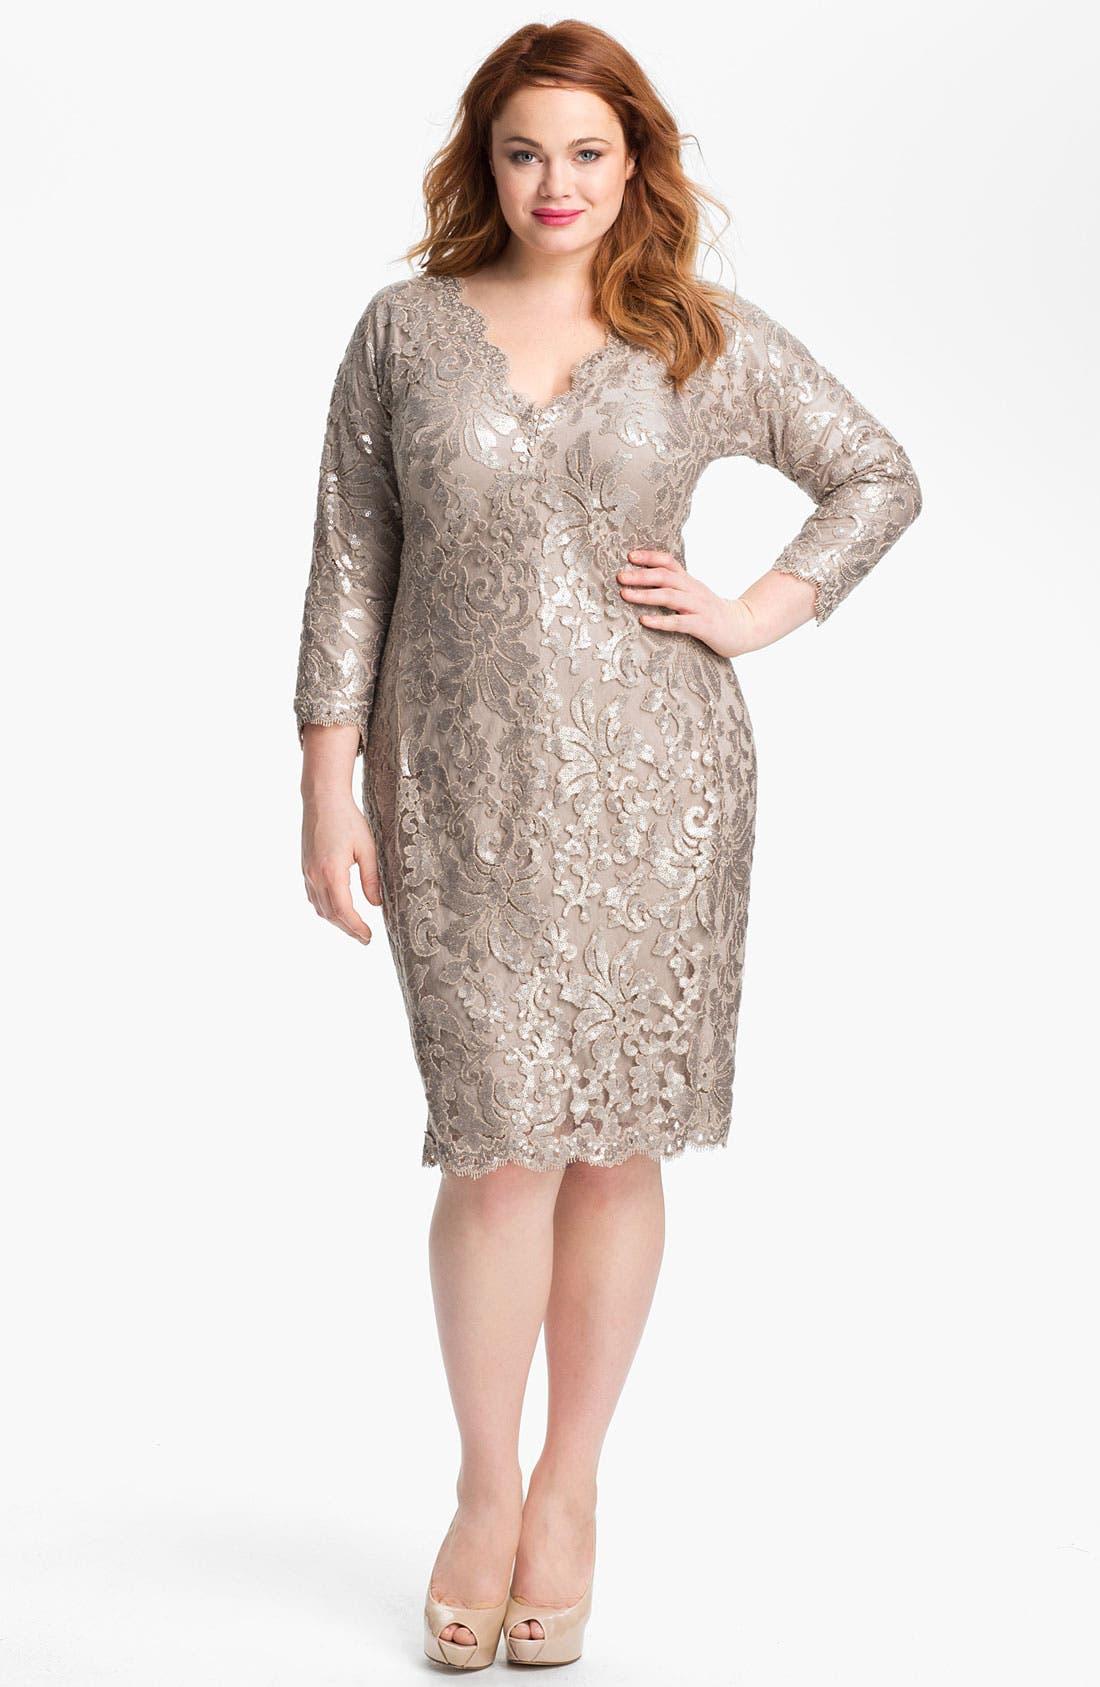 Main Image - Tadashi Shoji Metallic Jacquard Tulle & Lace Dress (Plus Size)